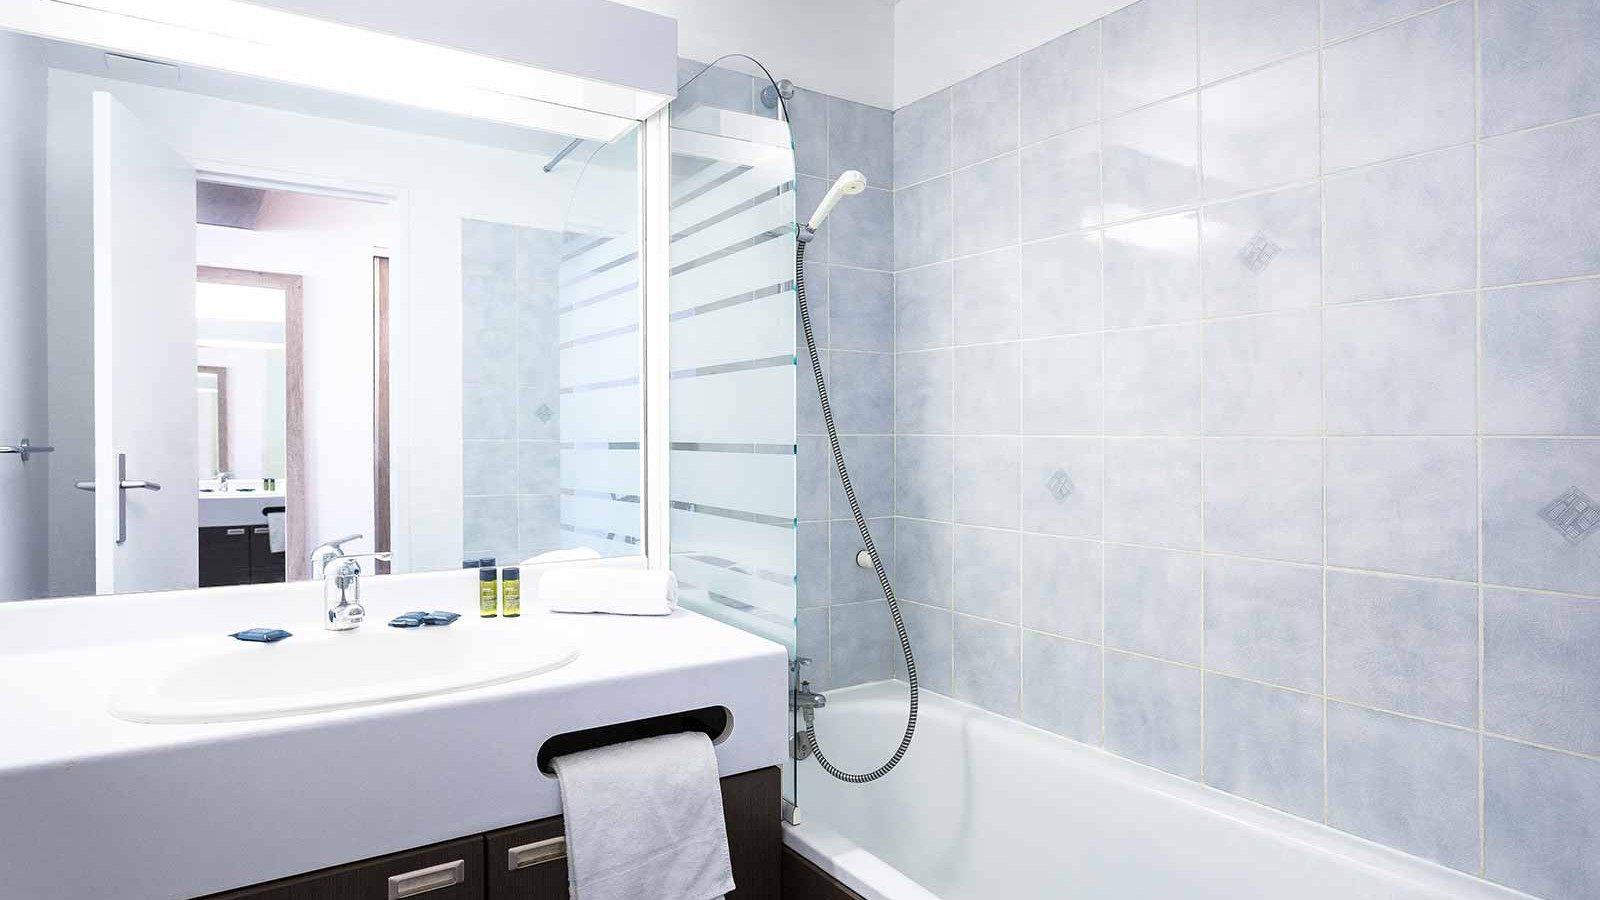 Hotel Club Les Panorama, Les Deux Alpes - Bathroom